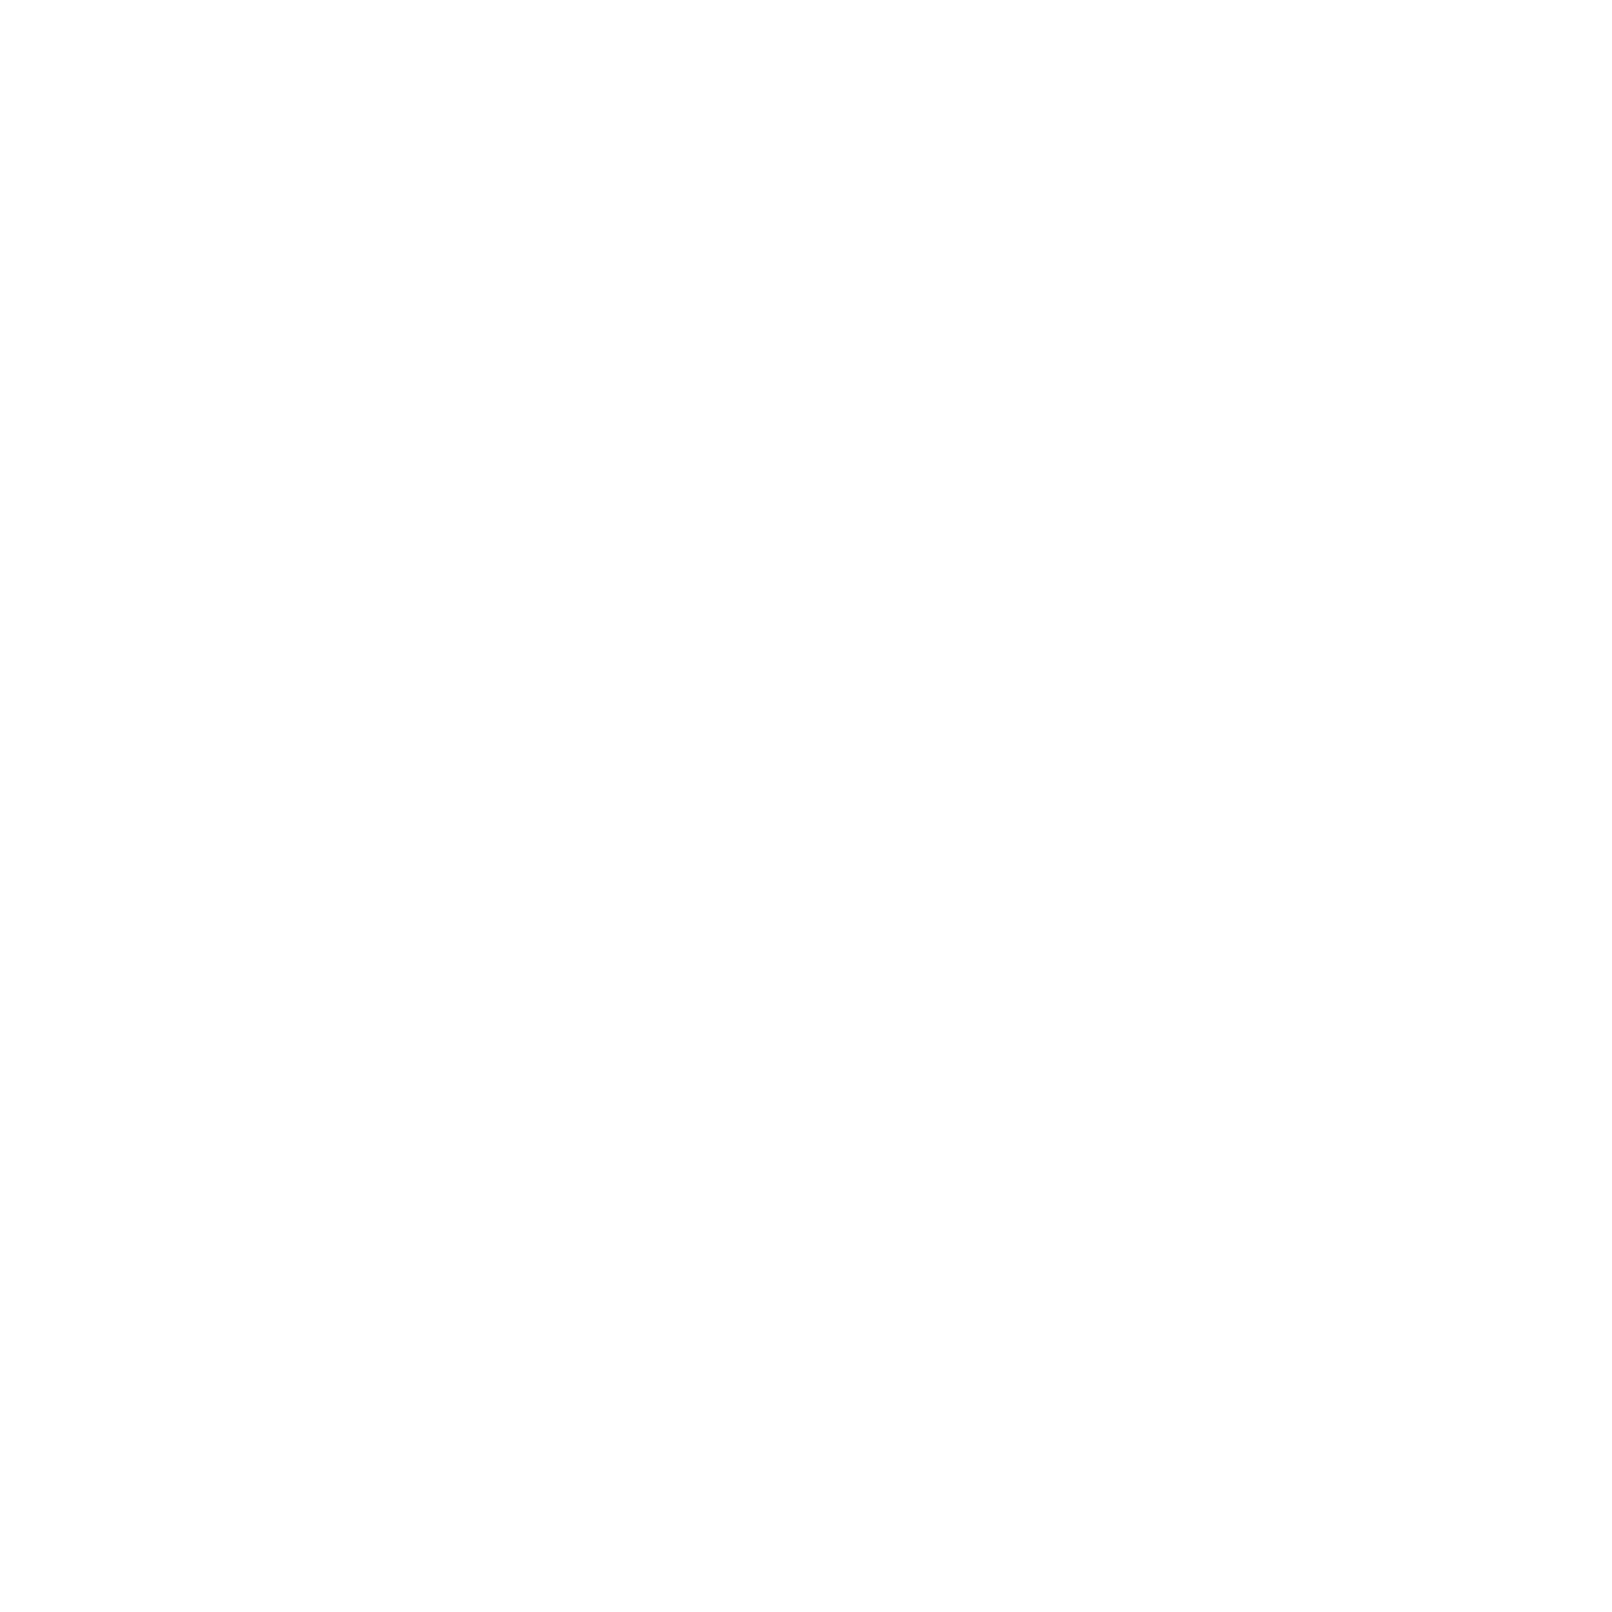 The Boardwalk Pizzeria